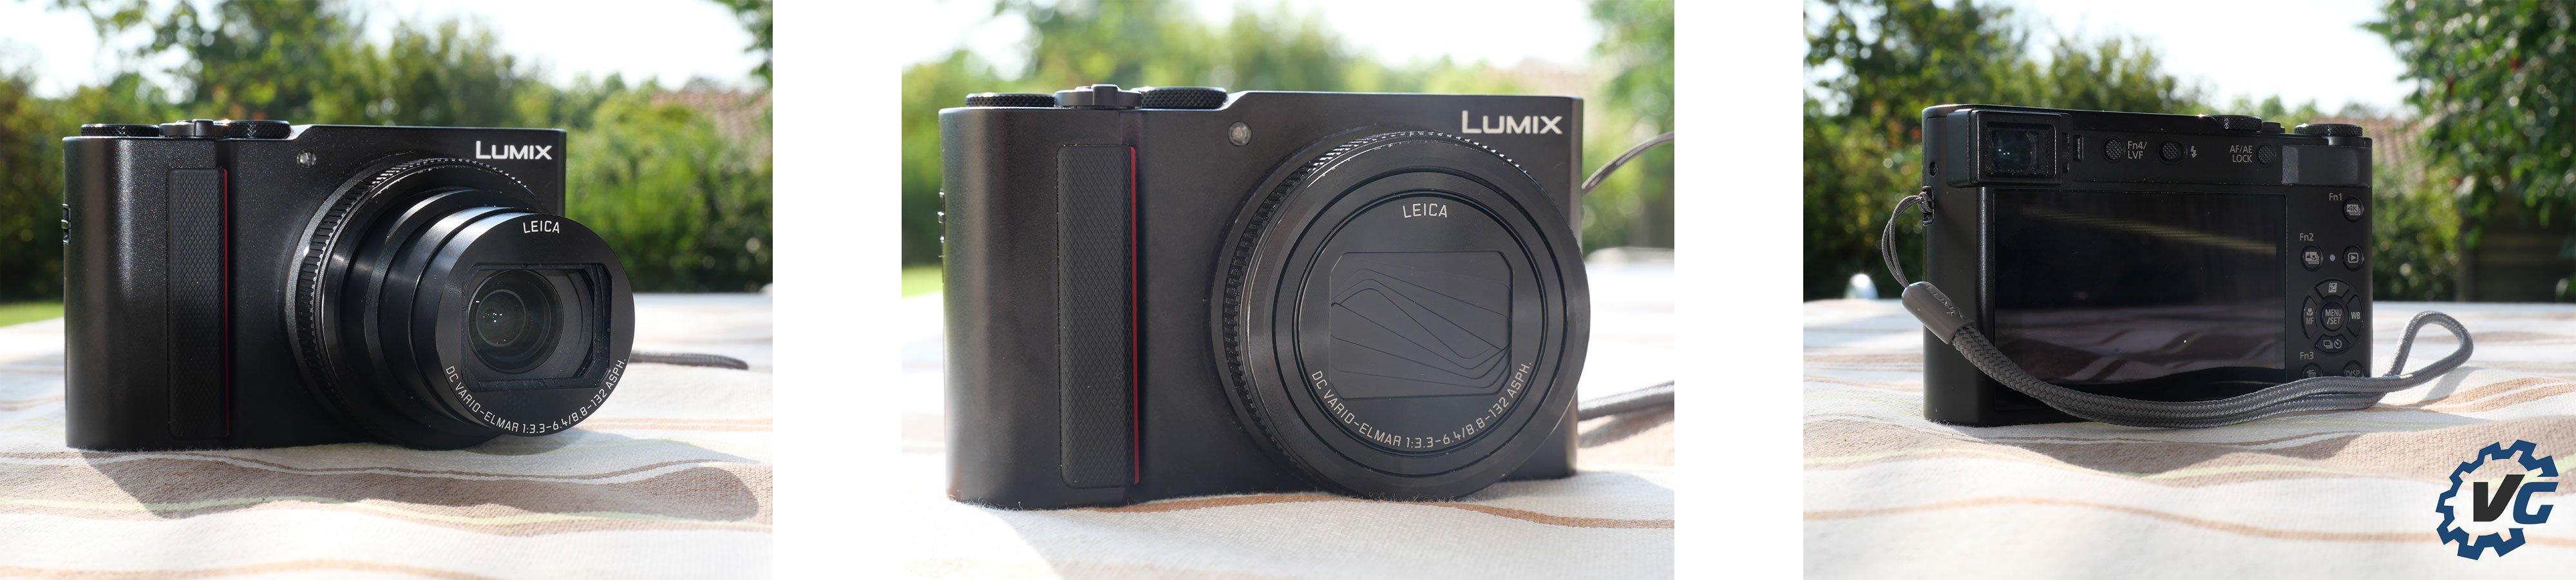 Design du Lumix TZ200